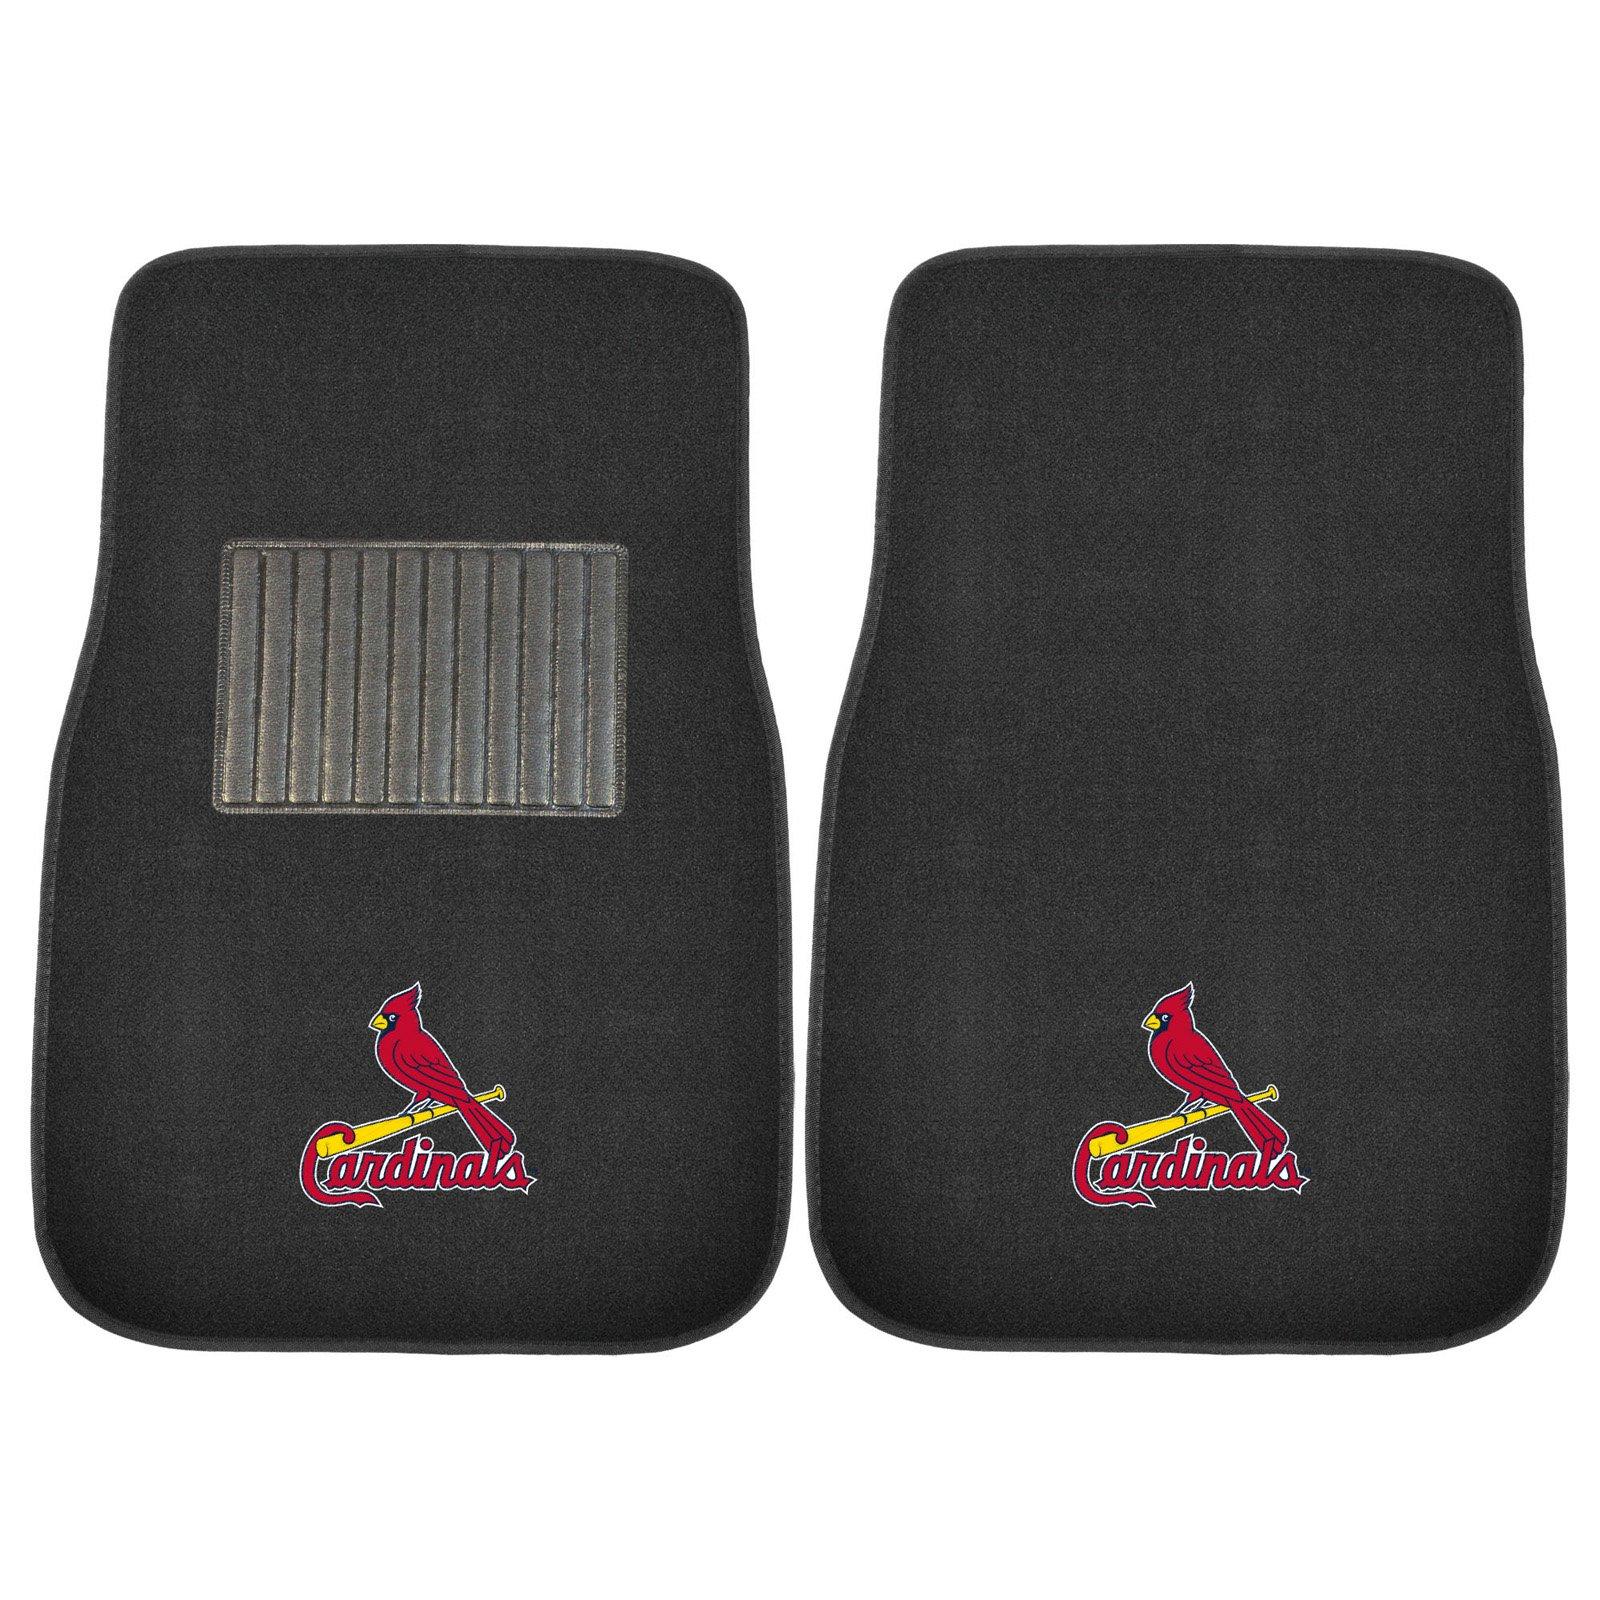 MLB St. Louis Cardinals Embroidered Car Mats